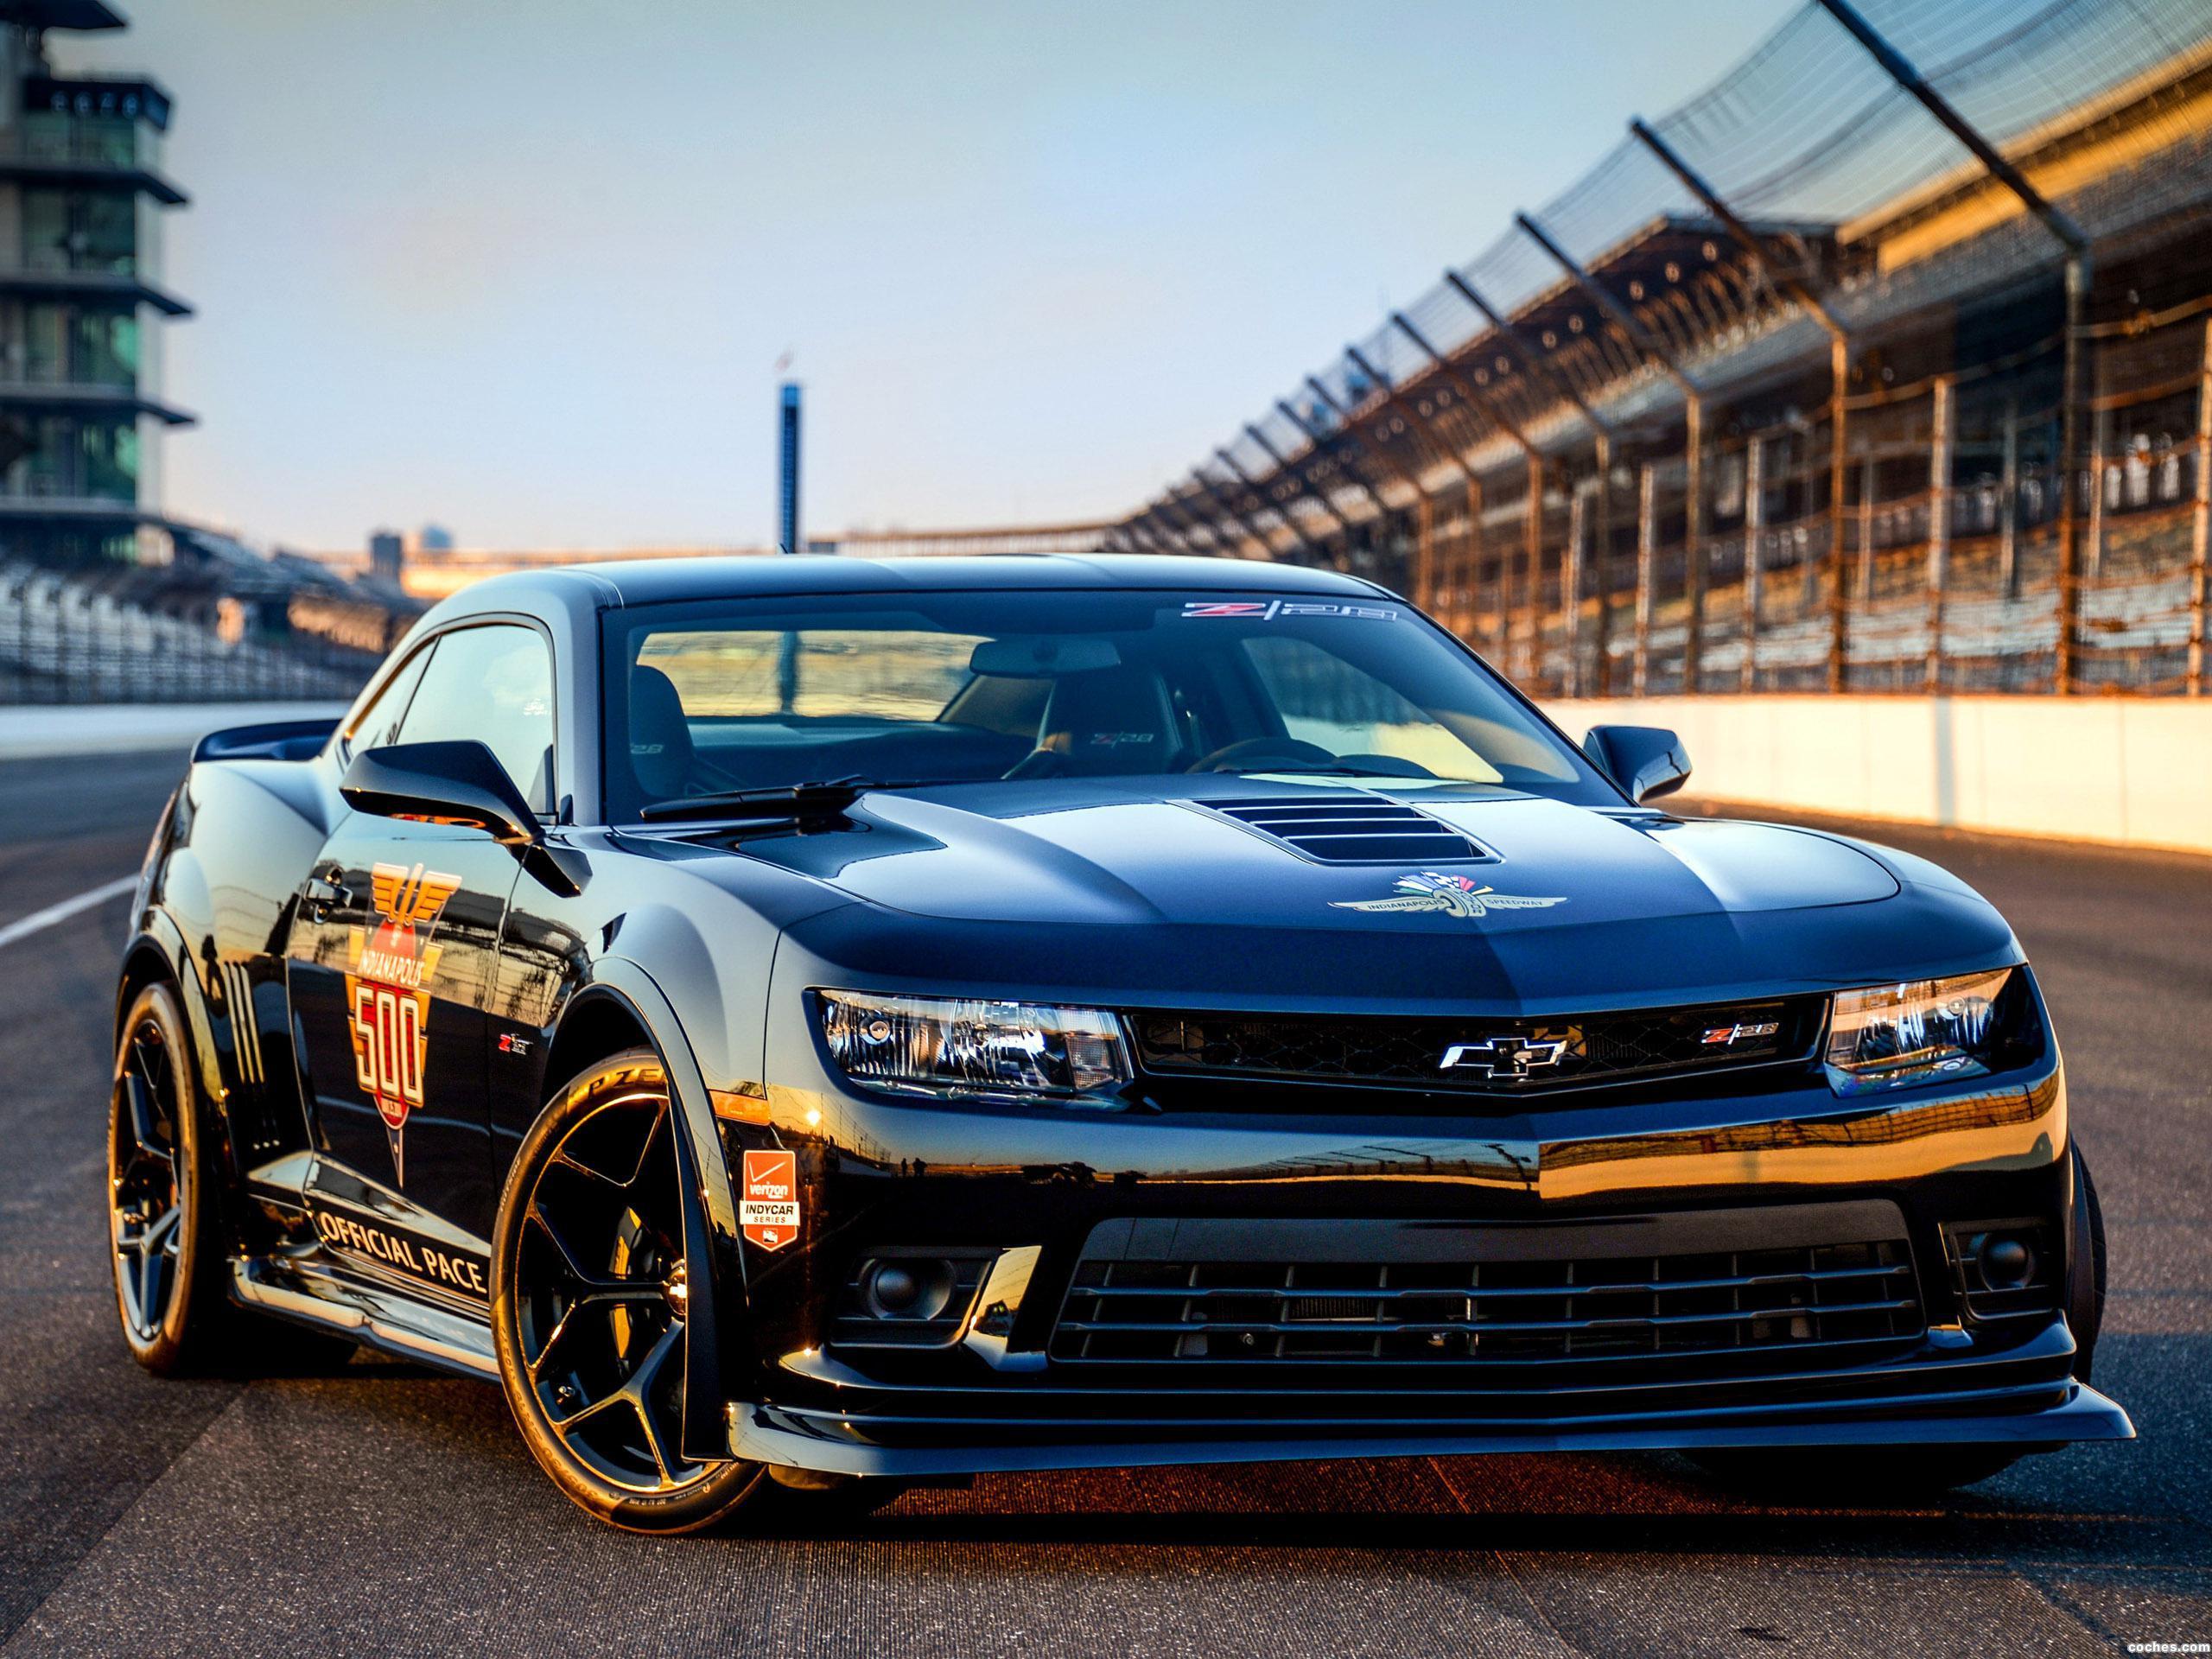 Foto 0 de Chevrolet Camaro Z-28 Indy 500 Pace Car 2014